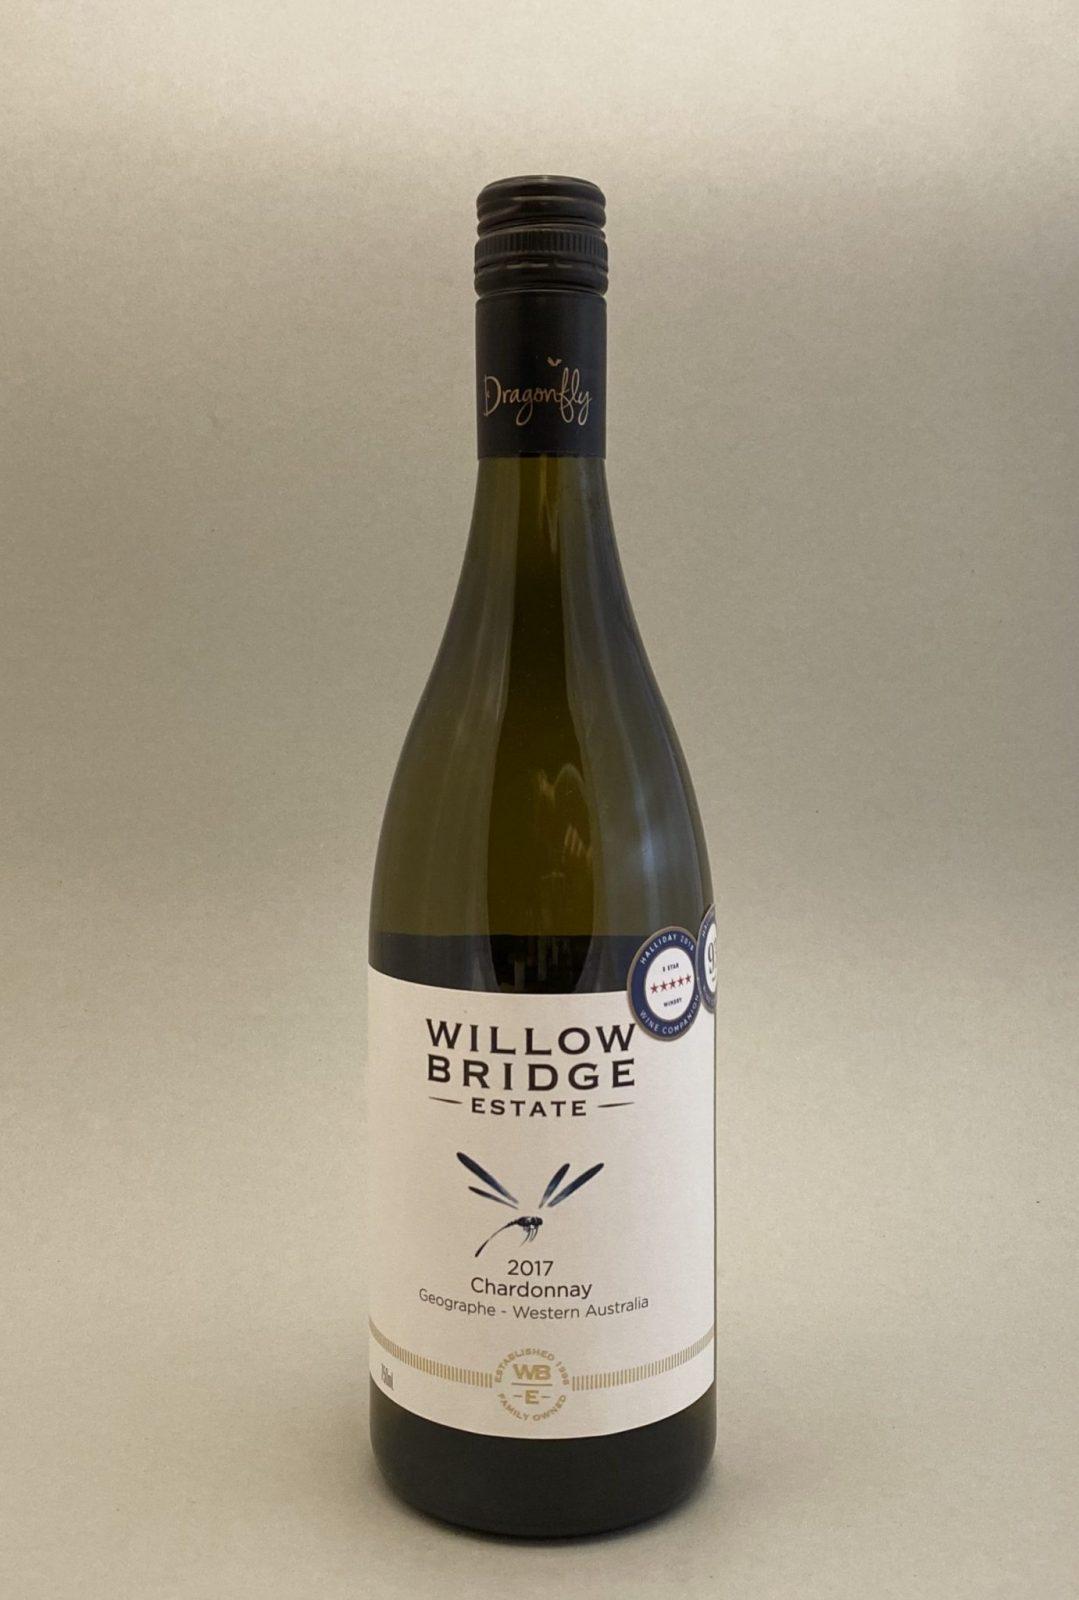 WILLOW BRIDGE Chardonnay 2017, vinoteka Bratislava slnecnice mesto, petrzalka, vino biele z Australie